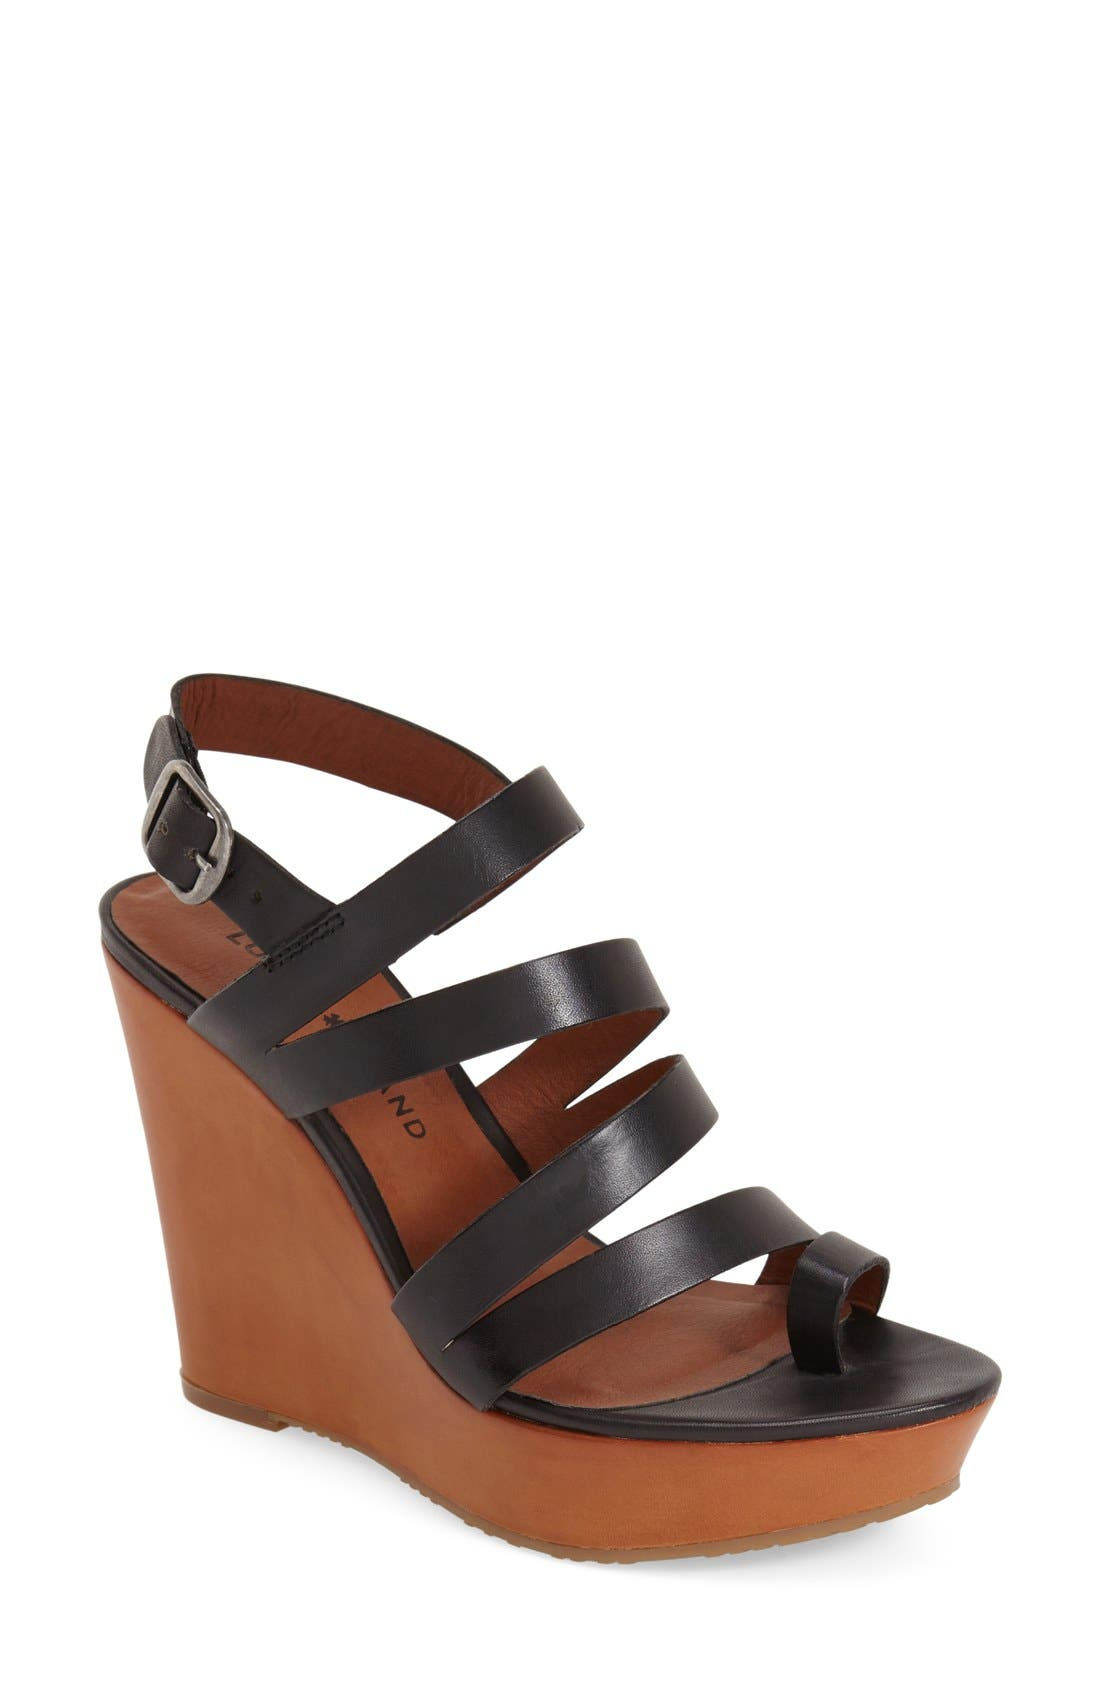 Main Image - Lucky Brand 'Fairfina' Wedge Sandal (Women)